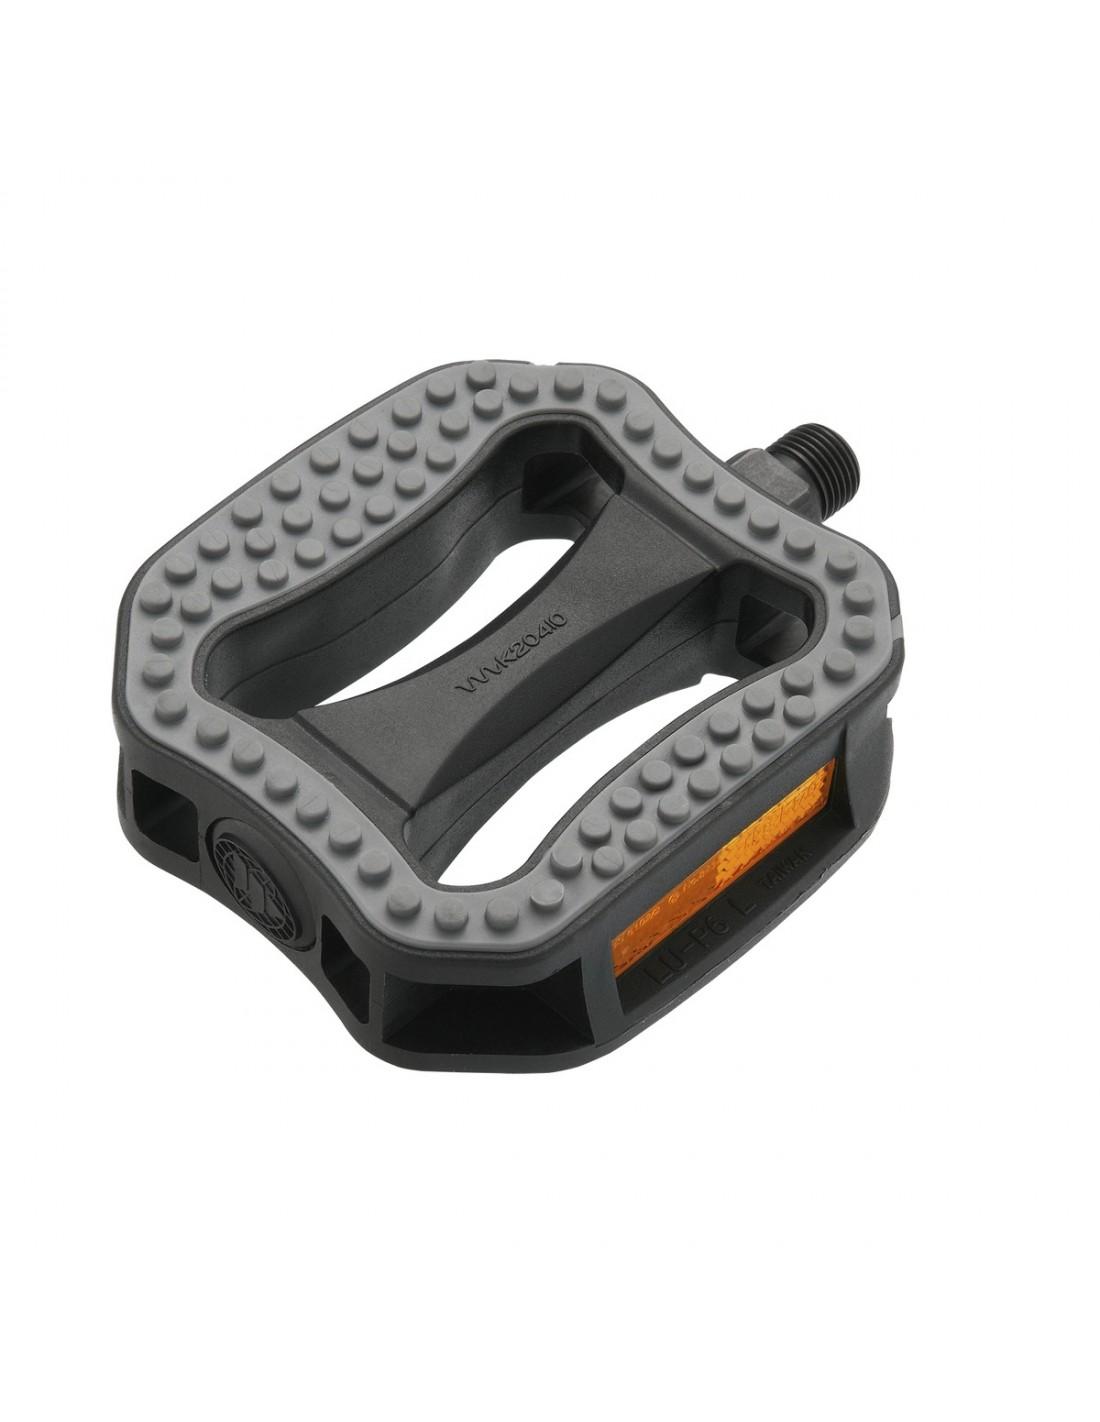 Pedaler Agilo Comfort Nylon Pedal 9/16 1724224 149 kr